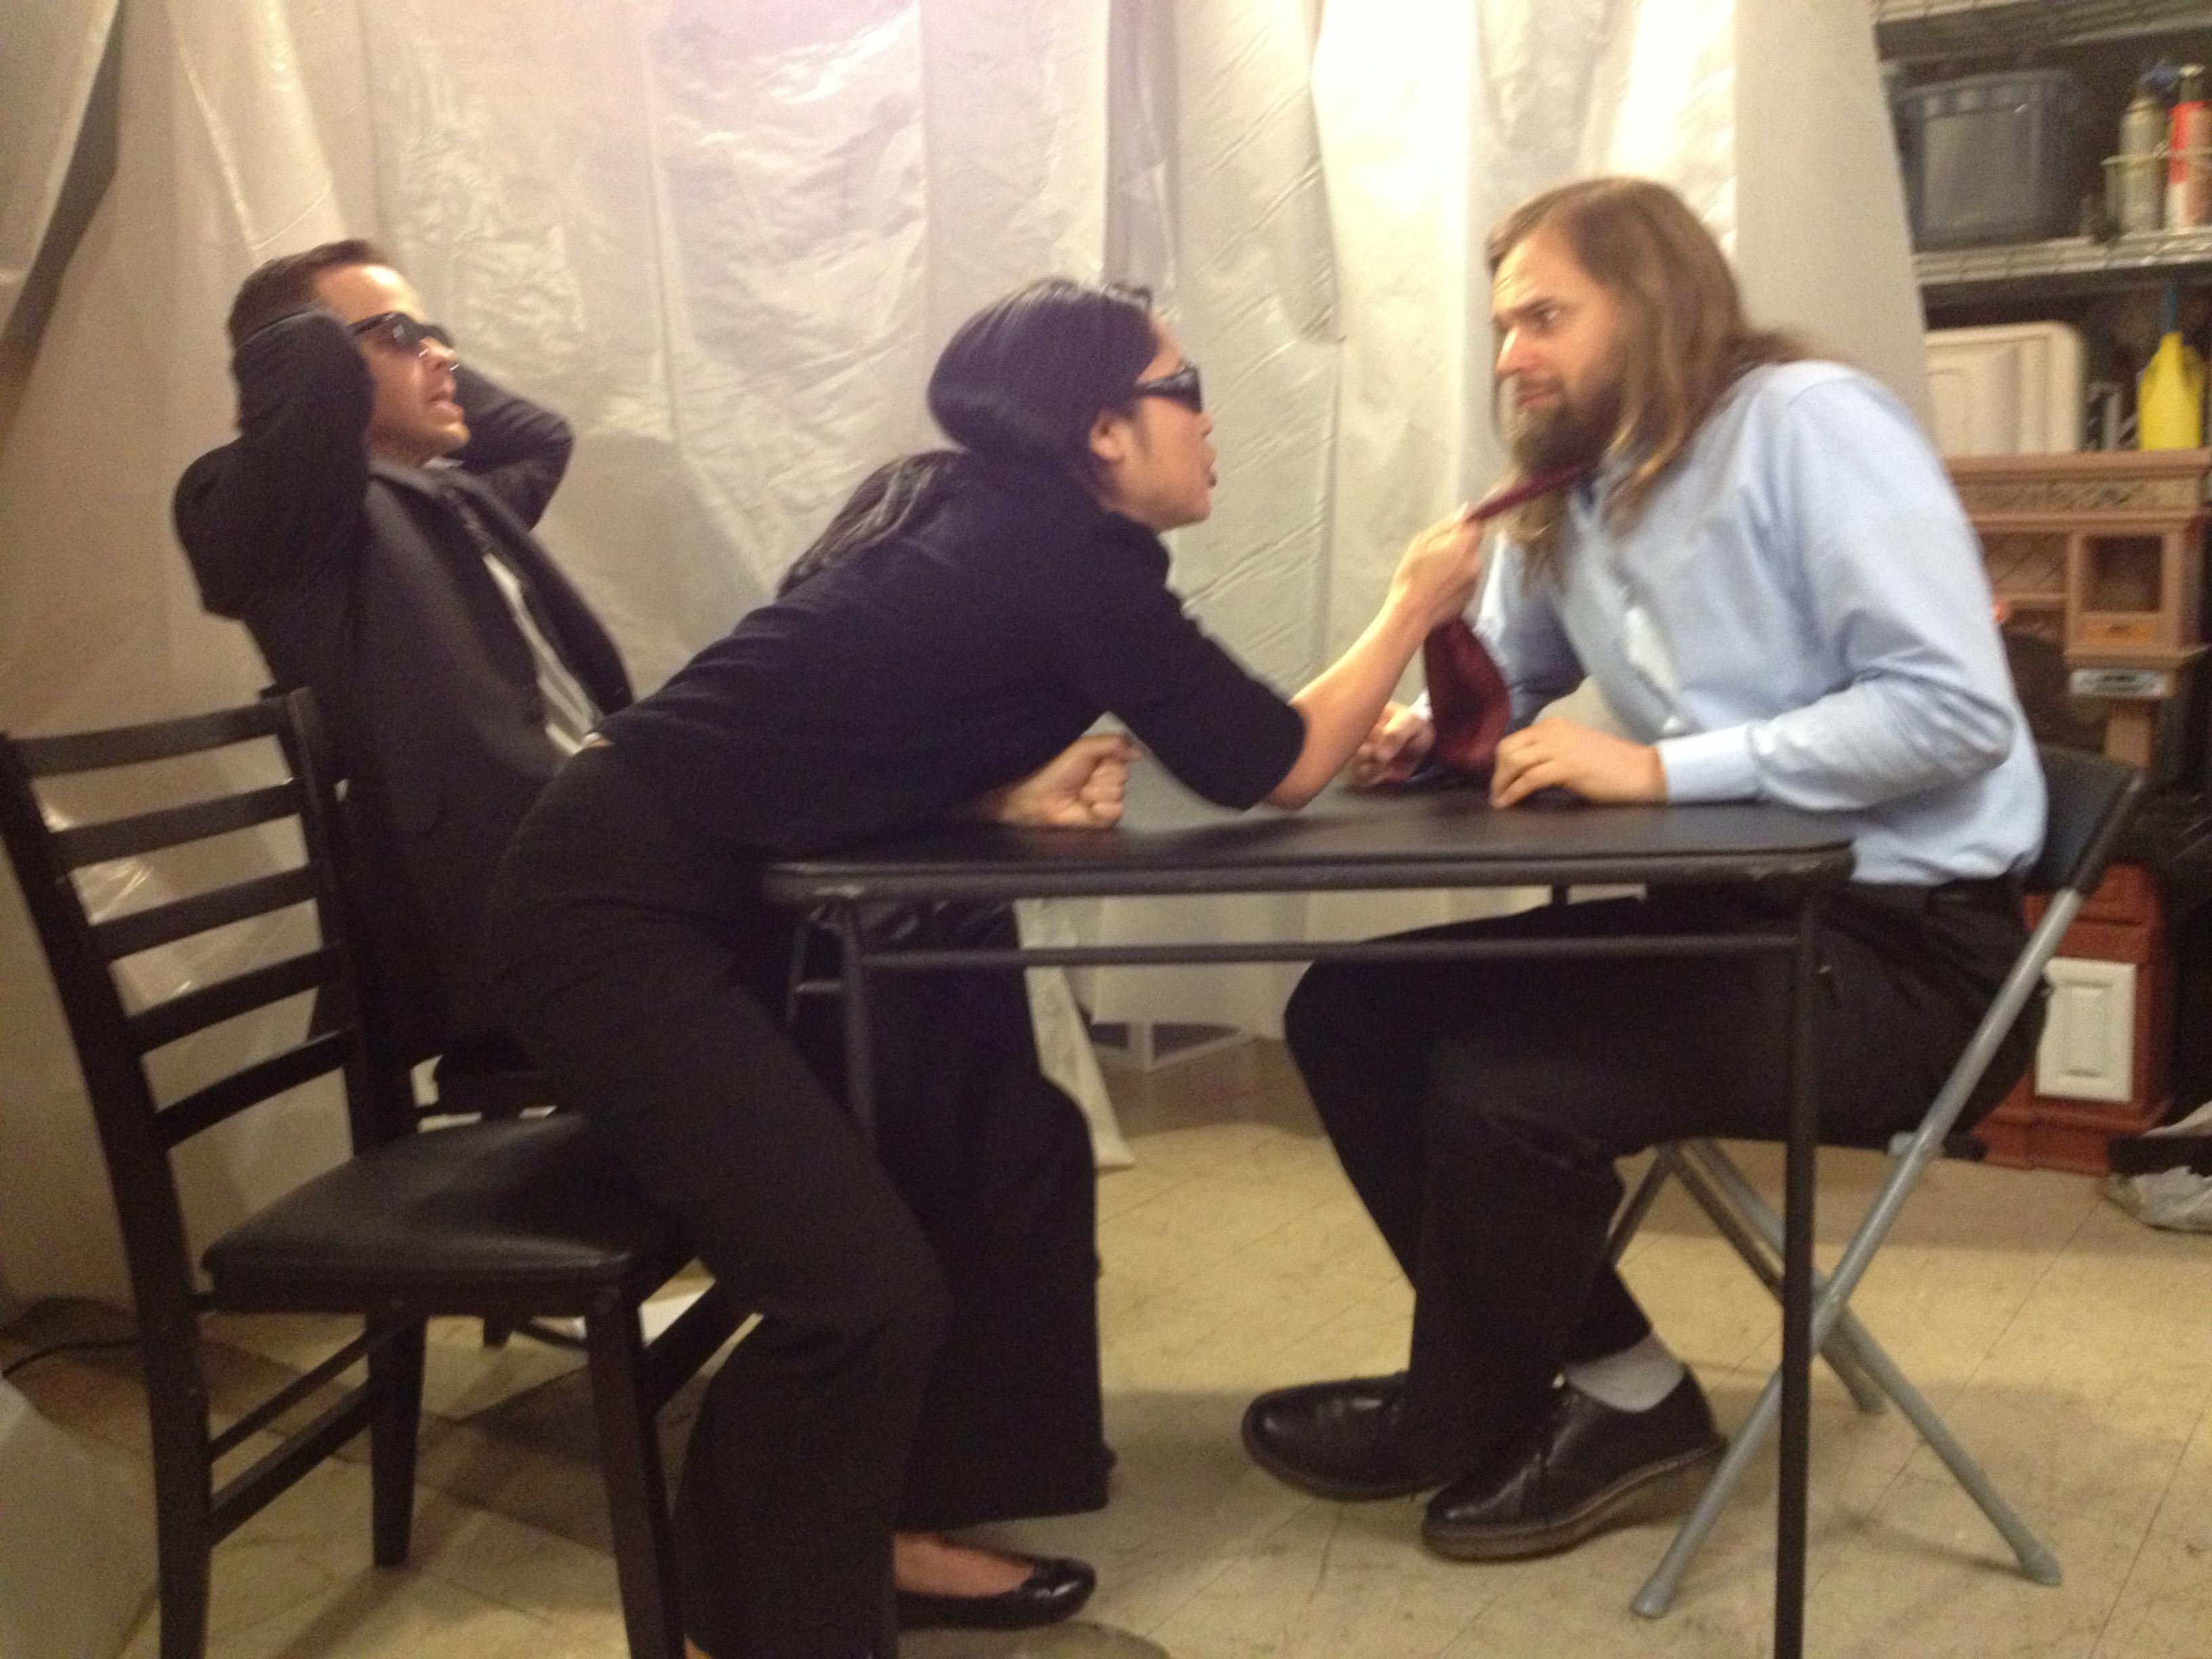 Clay Steakley, Cara Mitsuko, and Adam Hahn in WRNG in Studio City (2013)